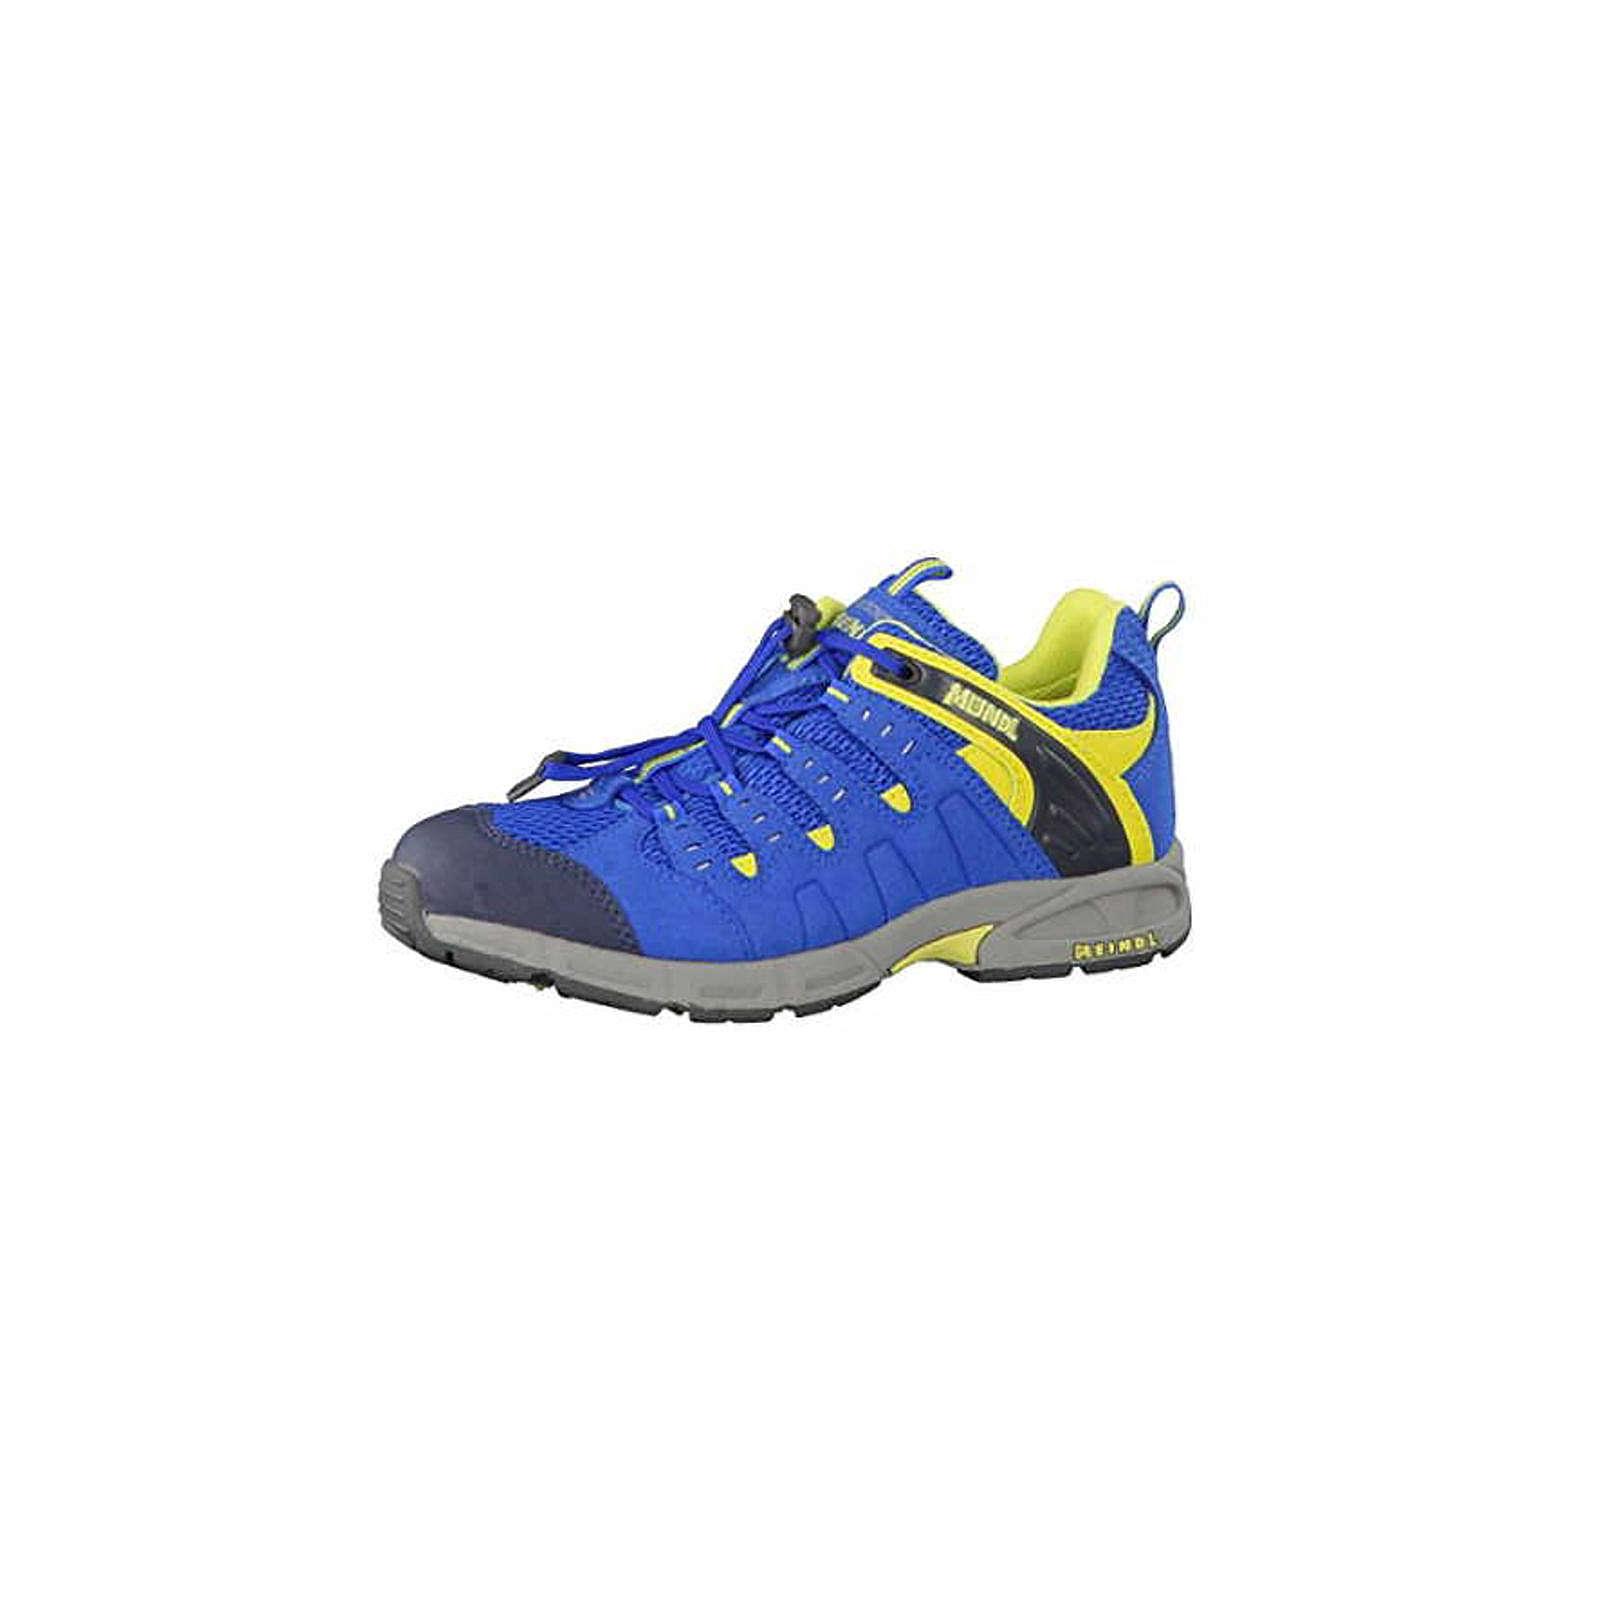 MEINDL Sportschuhe blau Junge Gr. 35